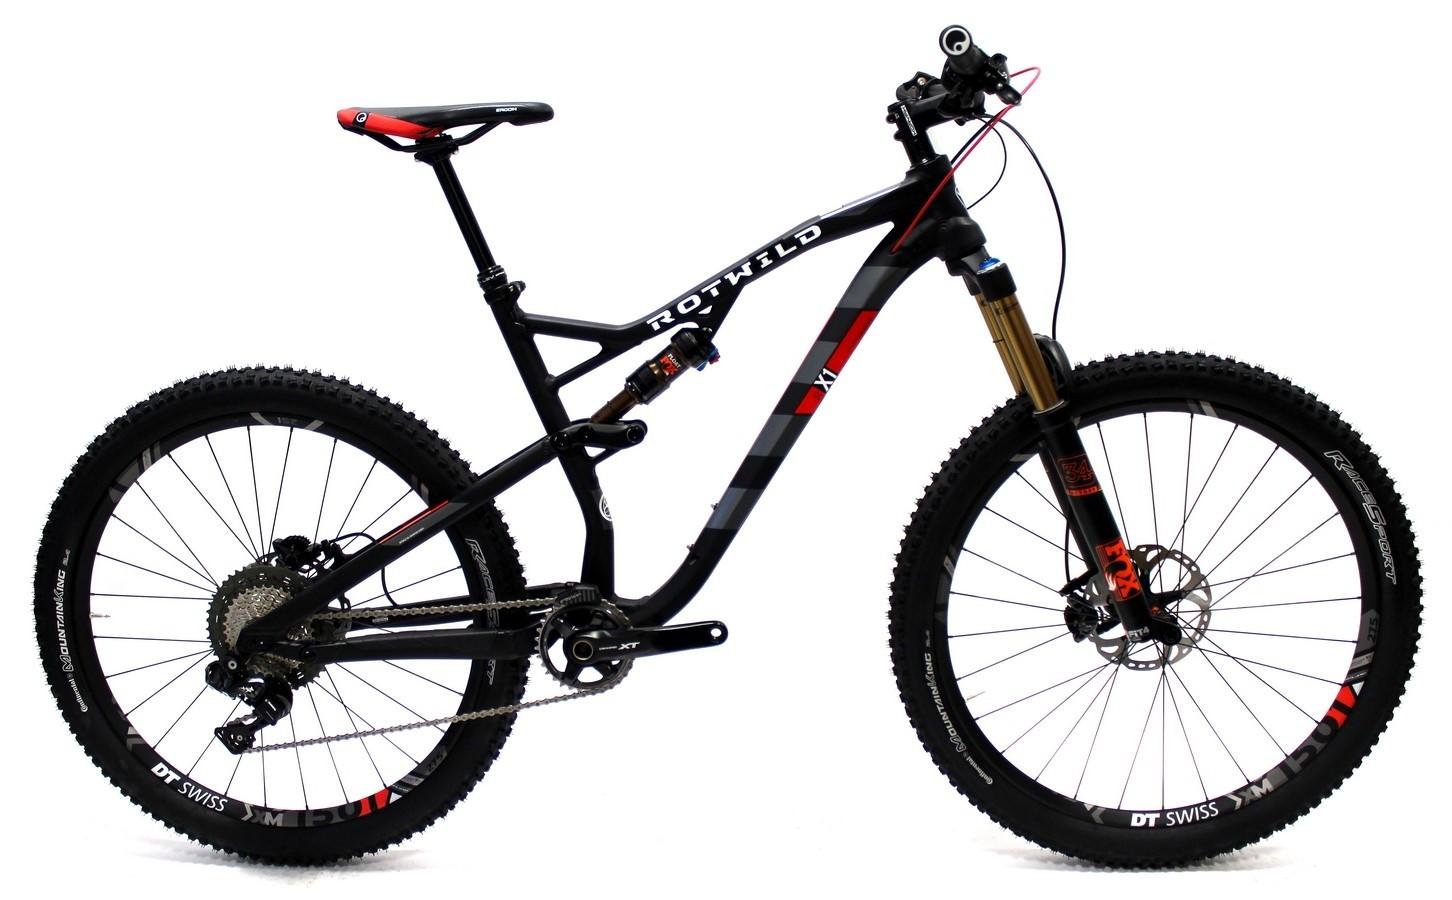 X1 FS 27.5+ Evo schwarz-matt